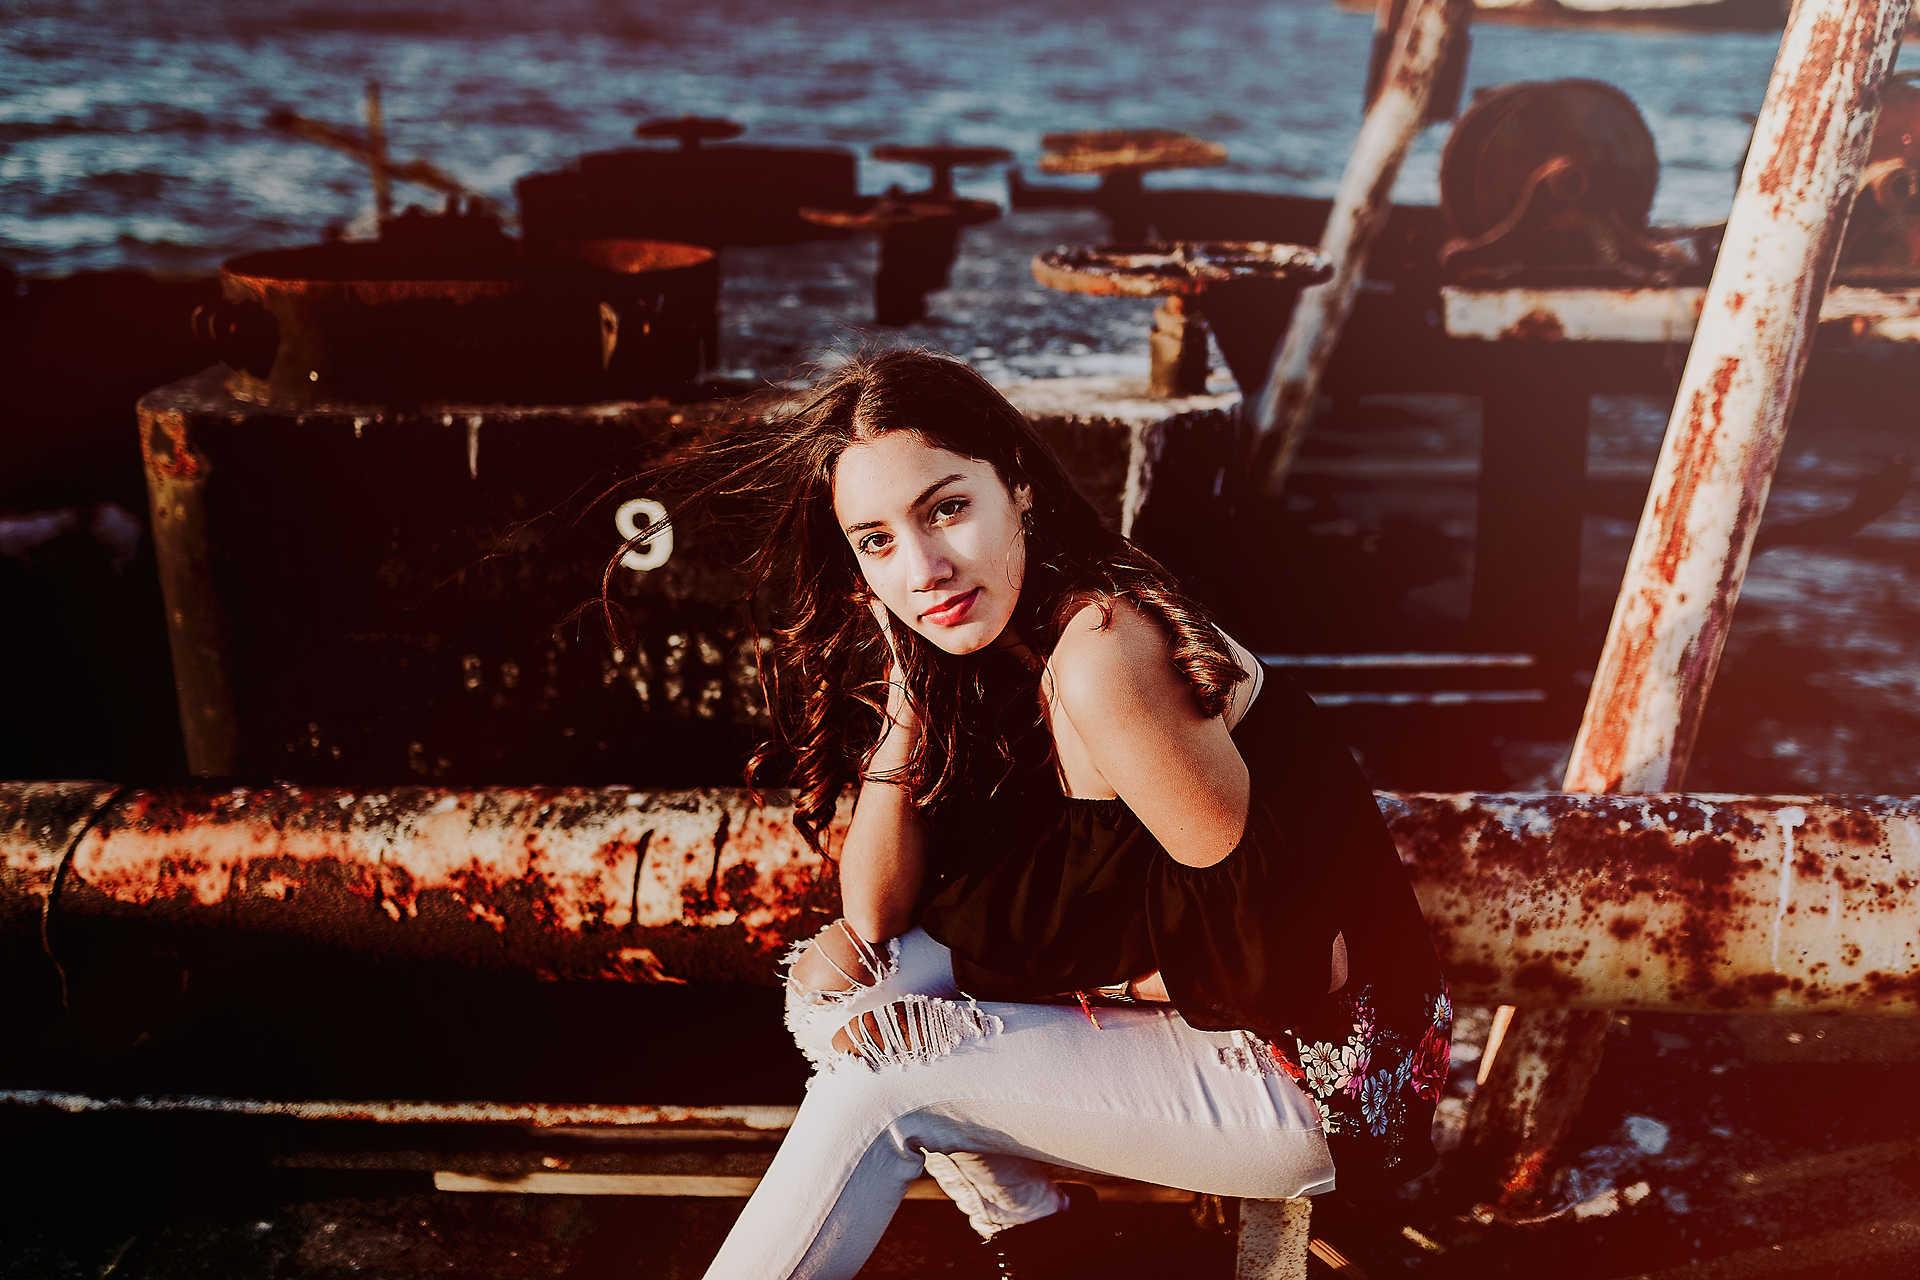 daniel-cante-fotografó-quince-años-la-paz-baja-california-sur-bcs-025.jpg